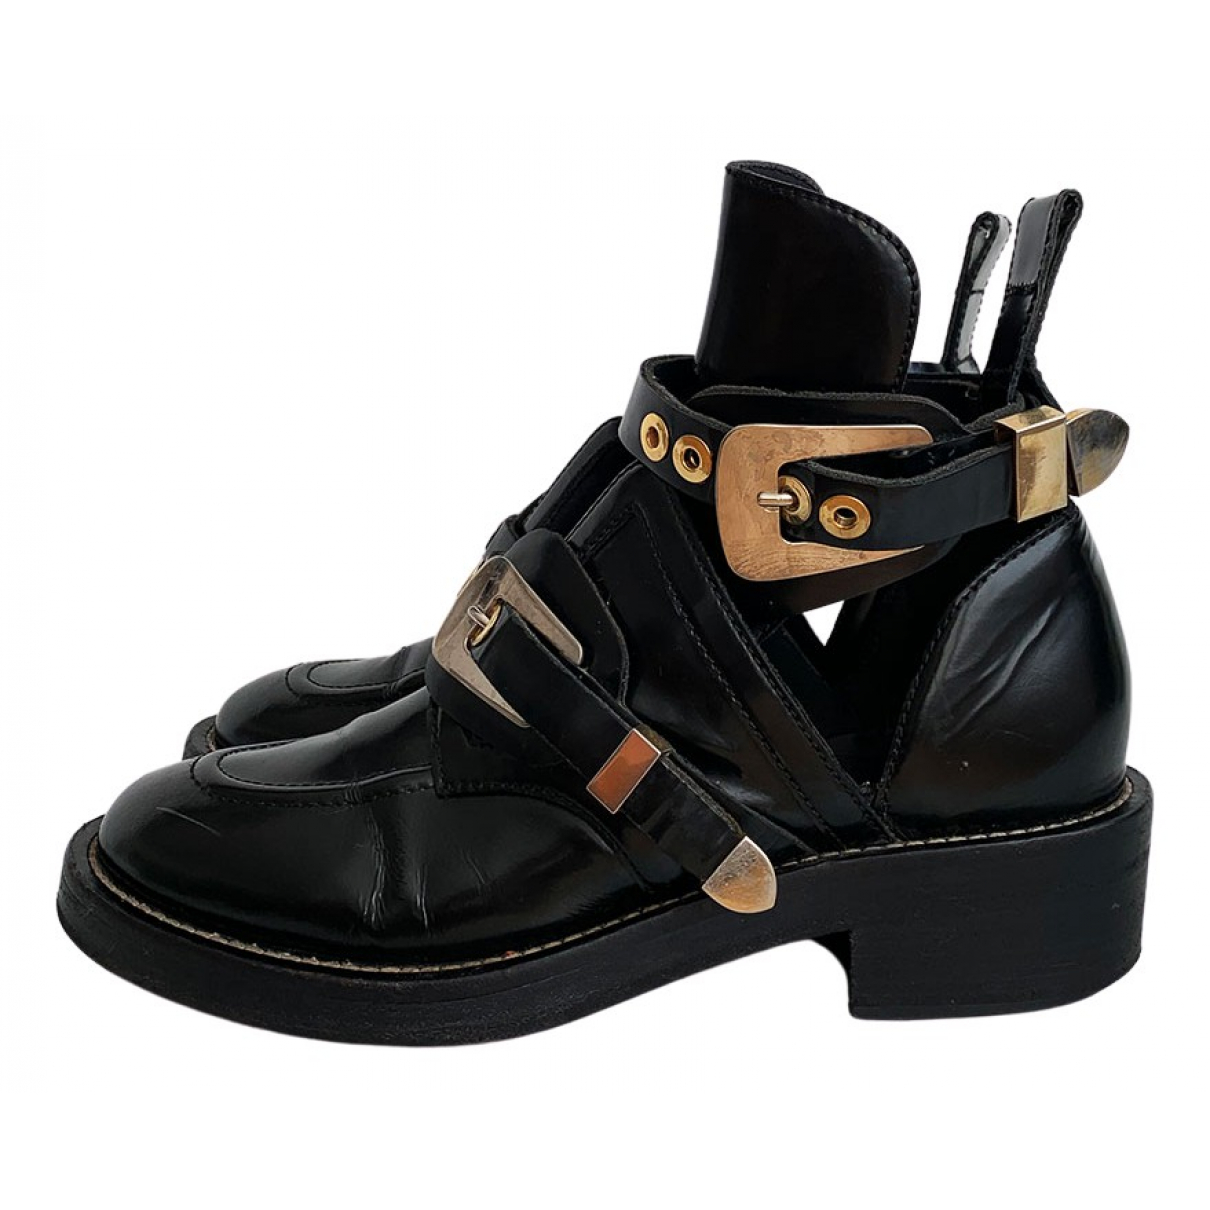 Balenciaga Ceinture Black Leather Ankle boots for Women 40.5 EU